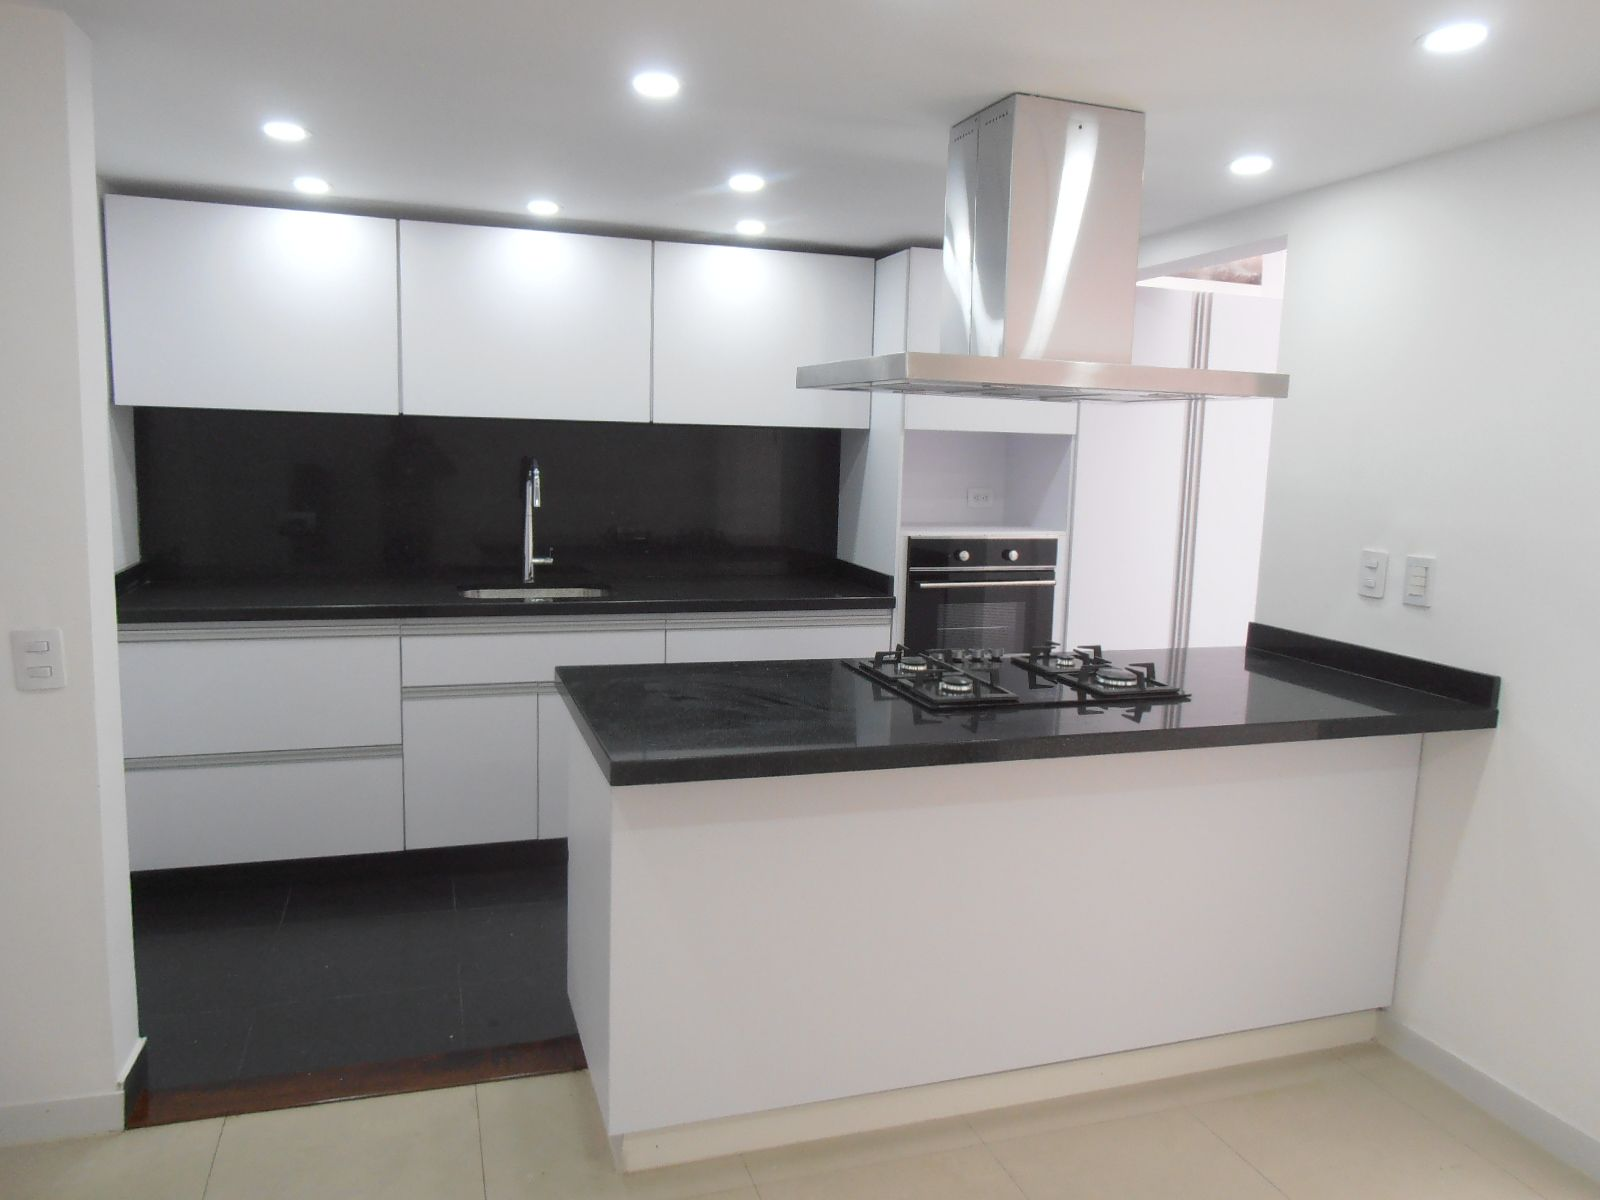 Disenos Cocinas Integrales - Arquitectura Del Hogar - Serart.net